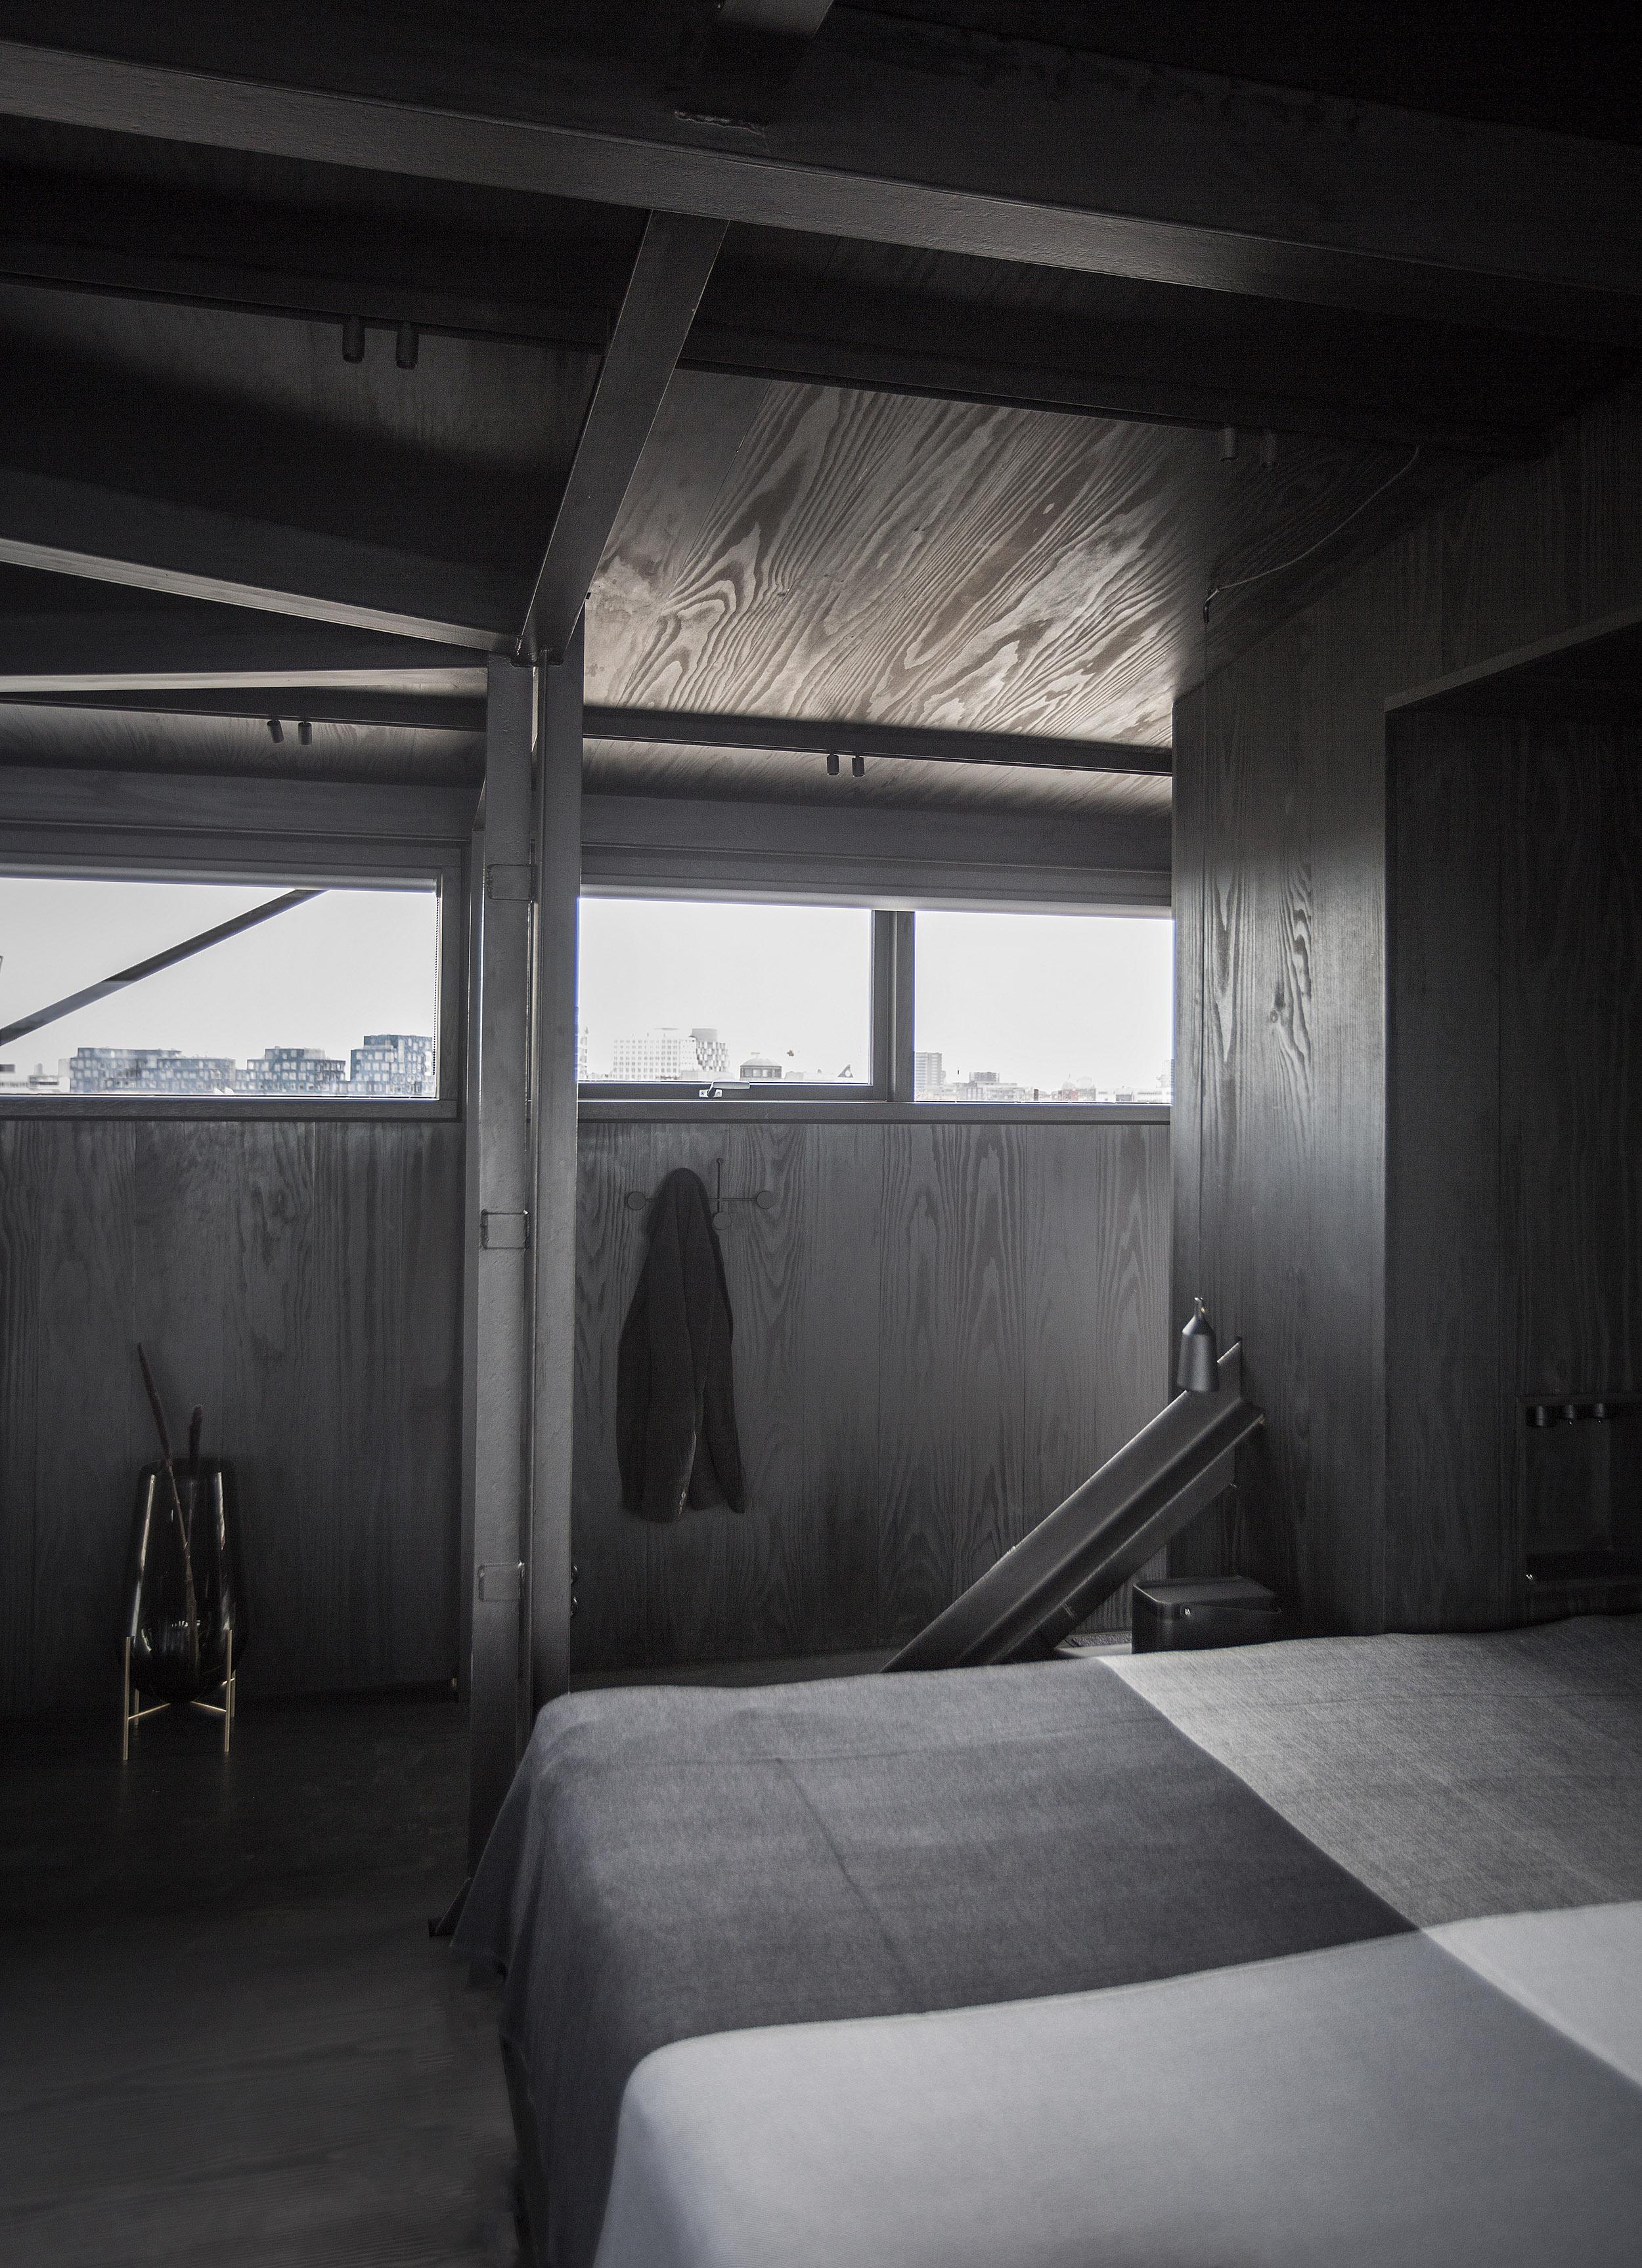 The Krane Copenhagen. A unique design hotel with a dark minimal interior